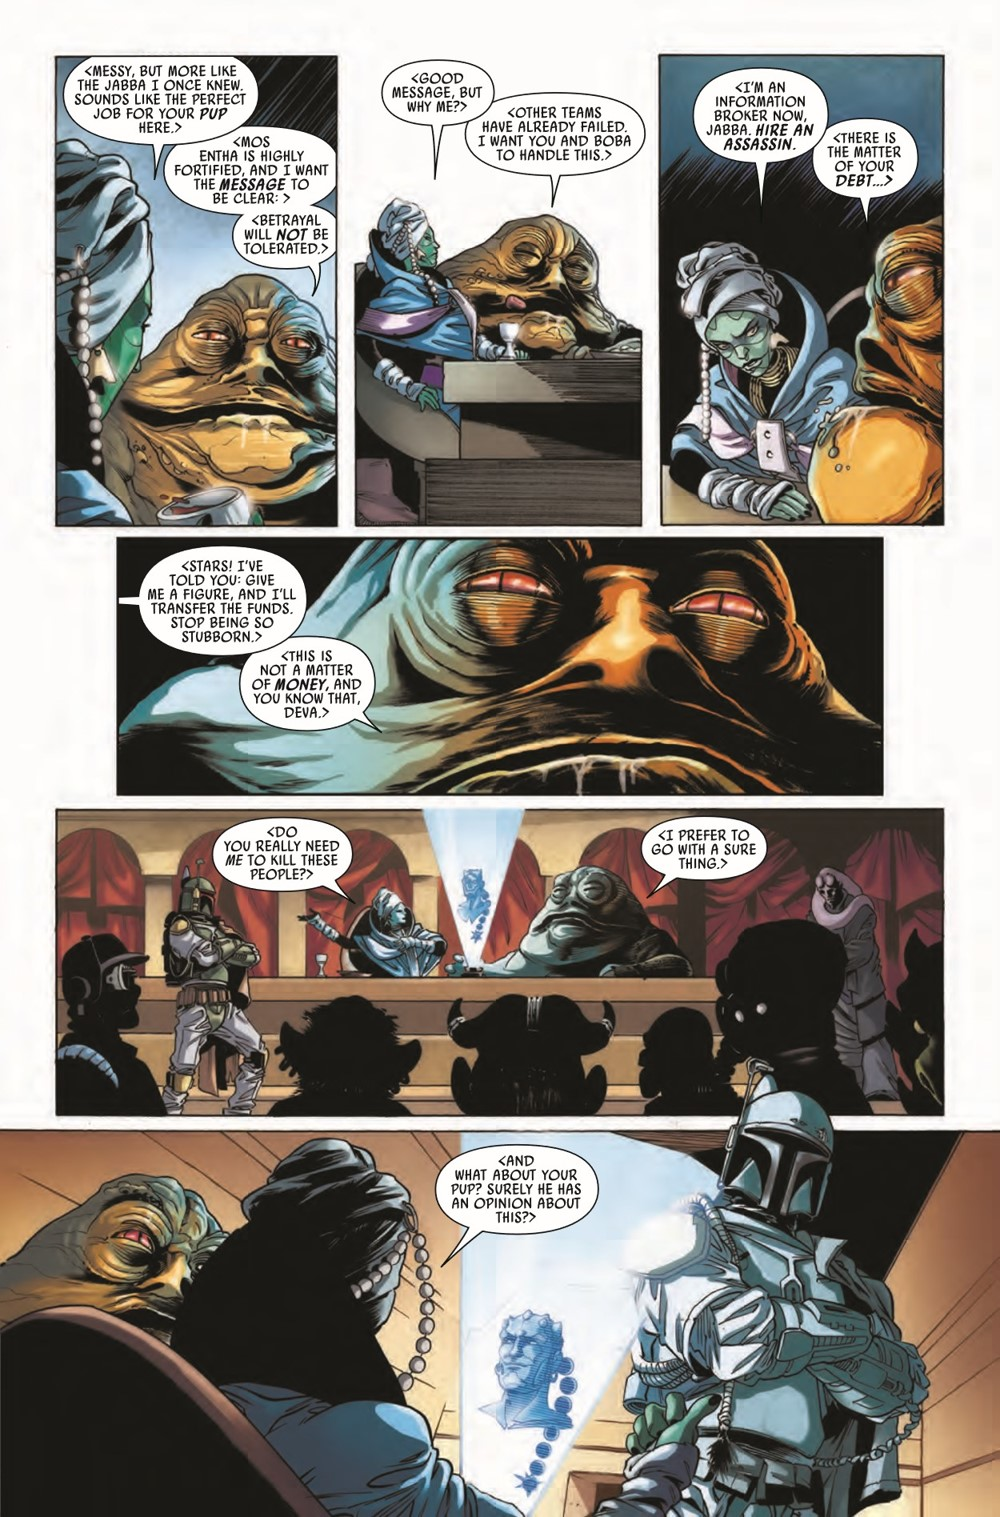 STWWAROTBHJABBAT2021001_Preview-6 ComicList Previews: STAR WARS WAR OF THE BOUNTY HUNTERS JABBA THE HUTT #1